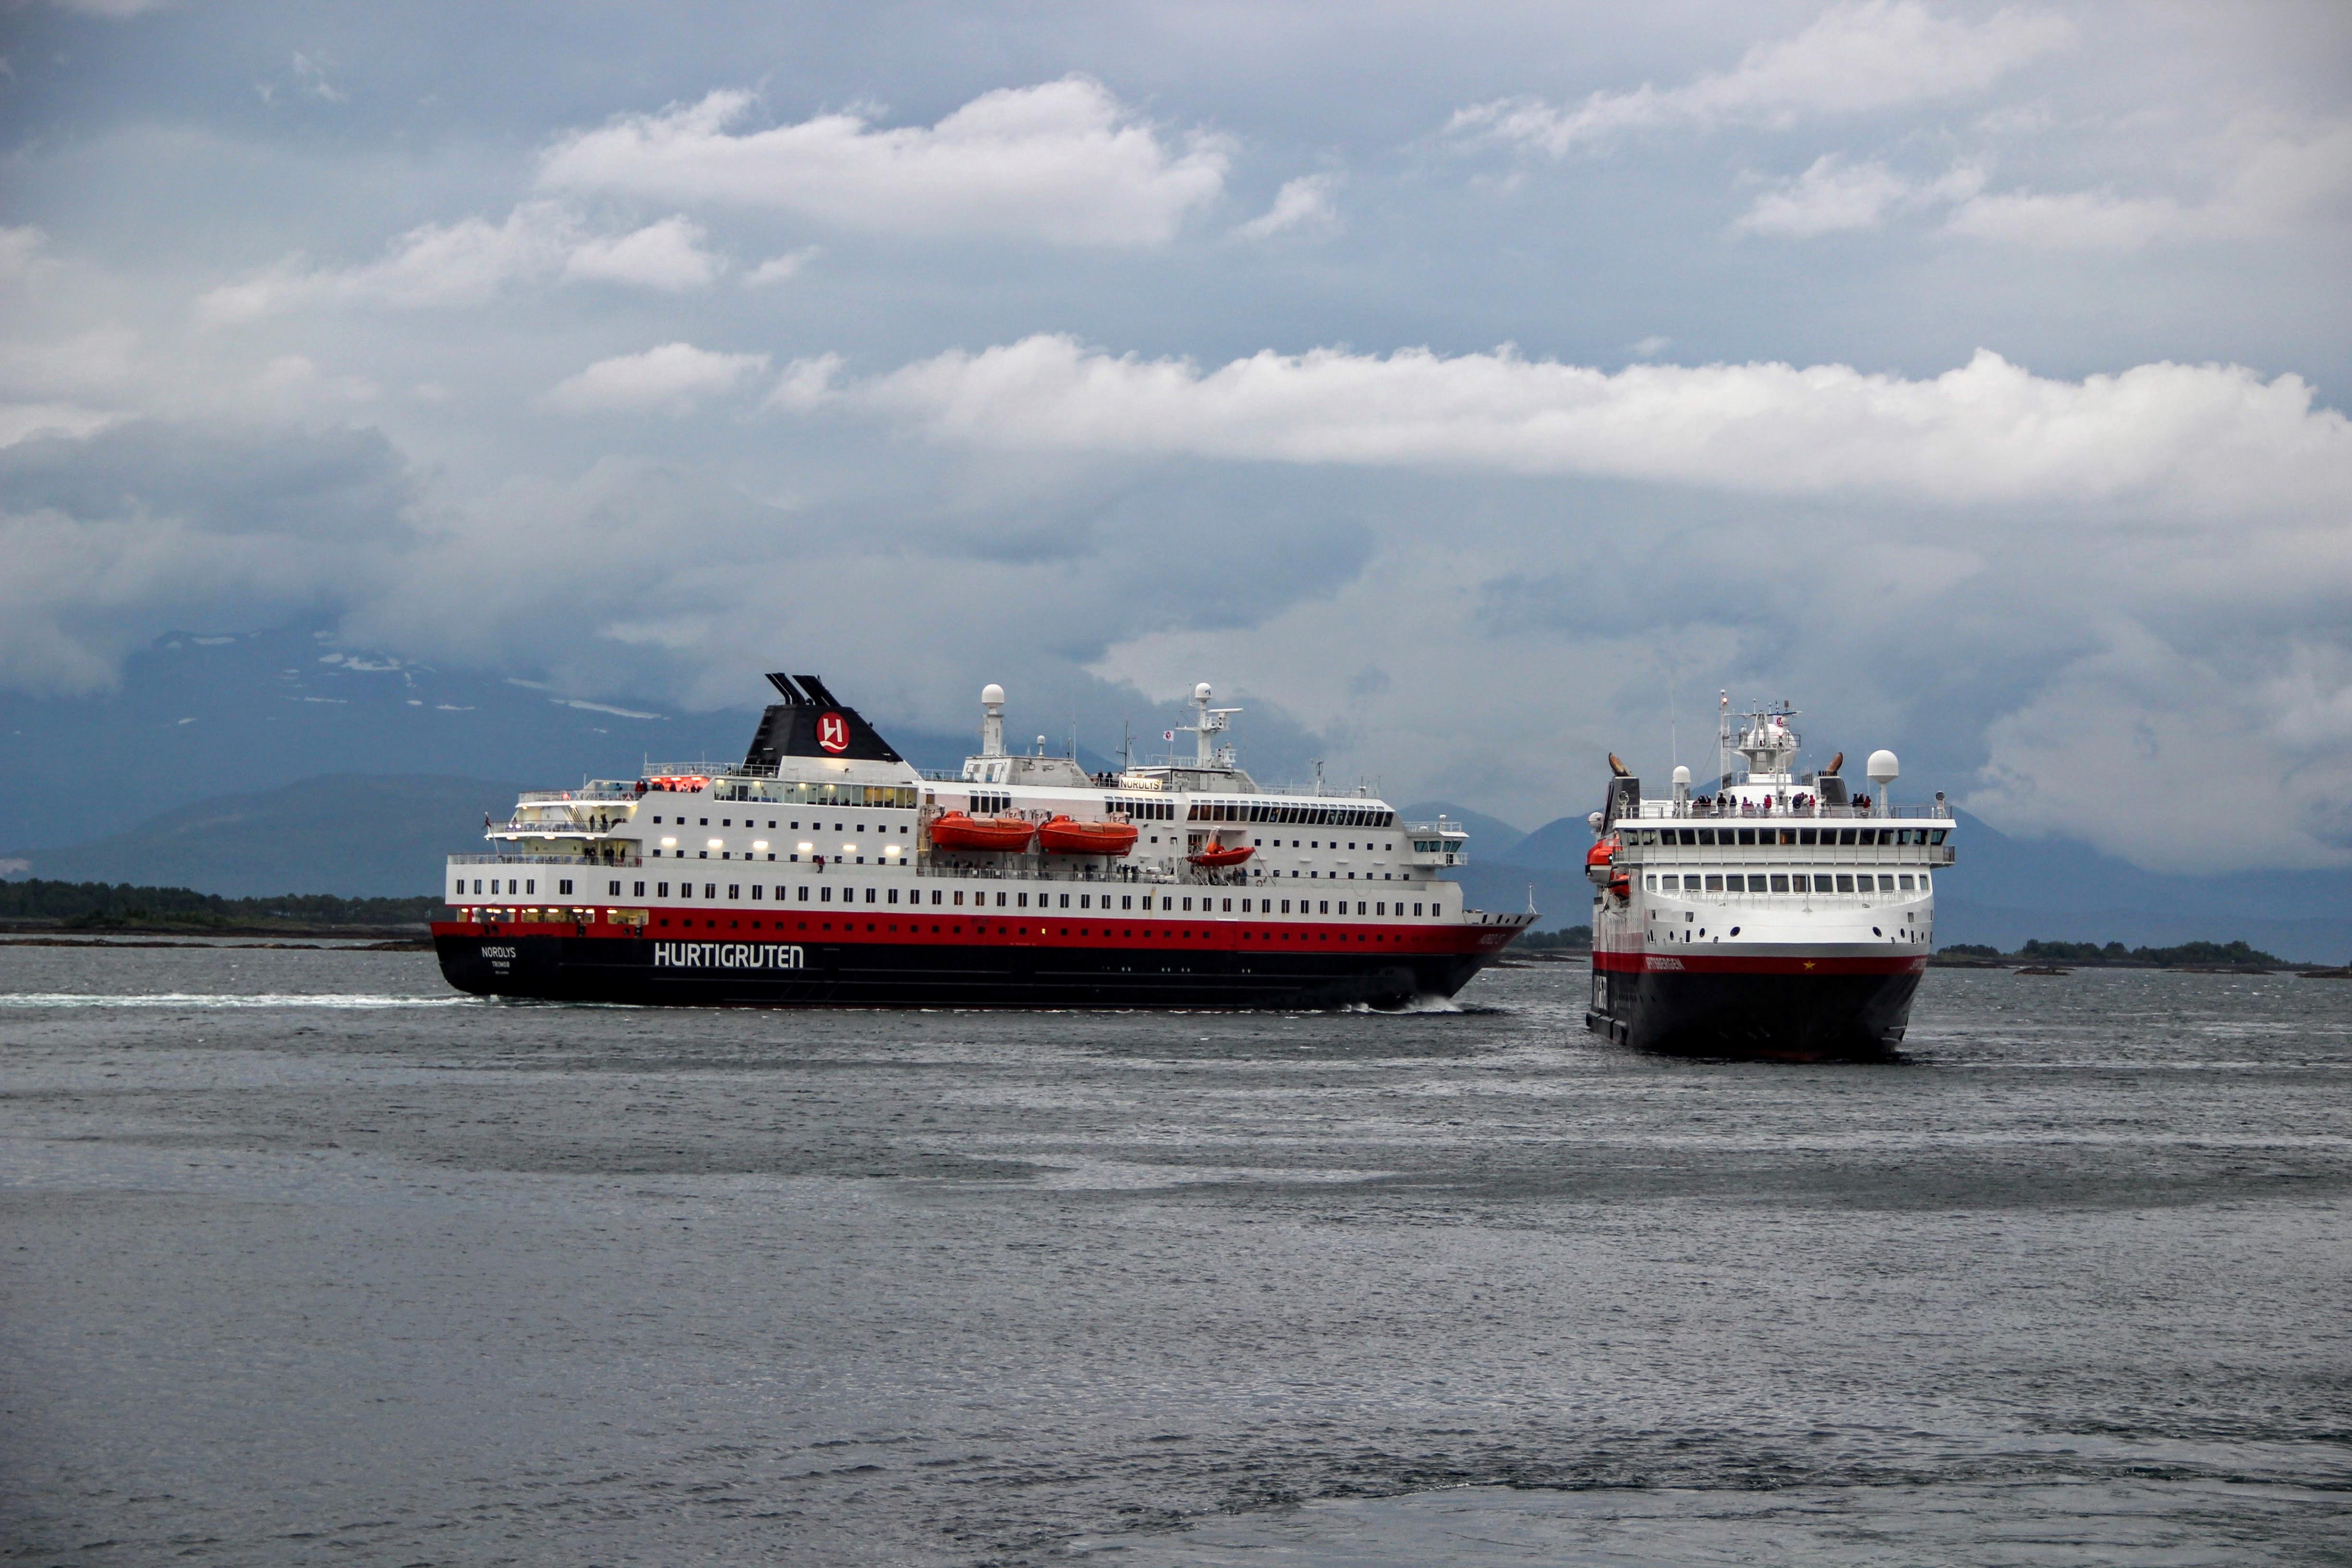 Bateaux de la flotte Hurtigruten